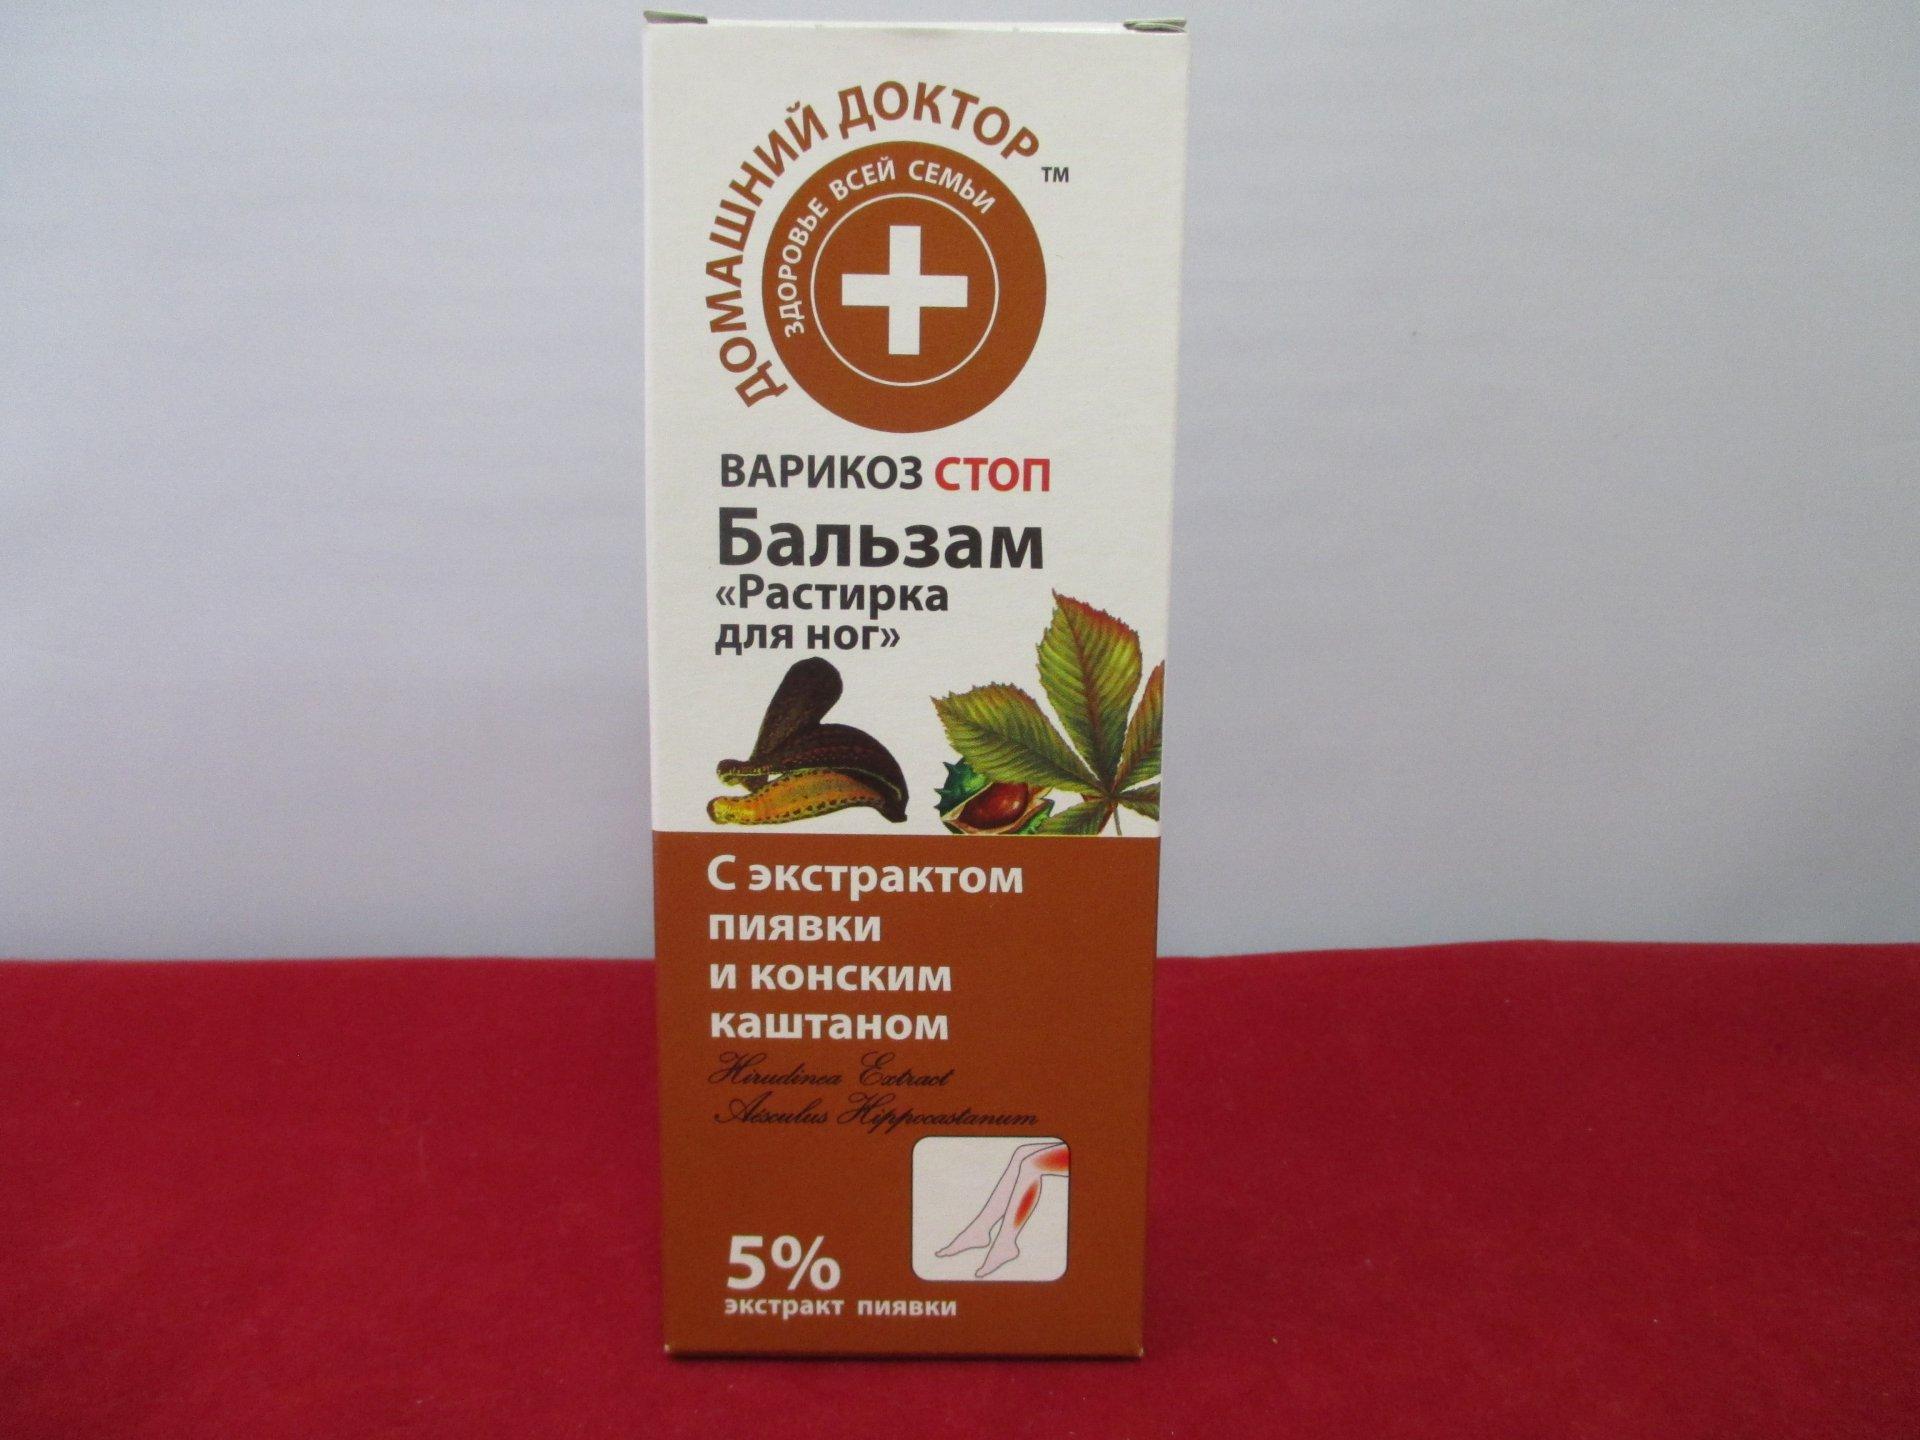 Варикоз: лечение в домашних условиях травами 2